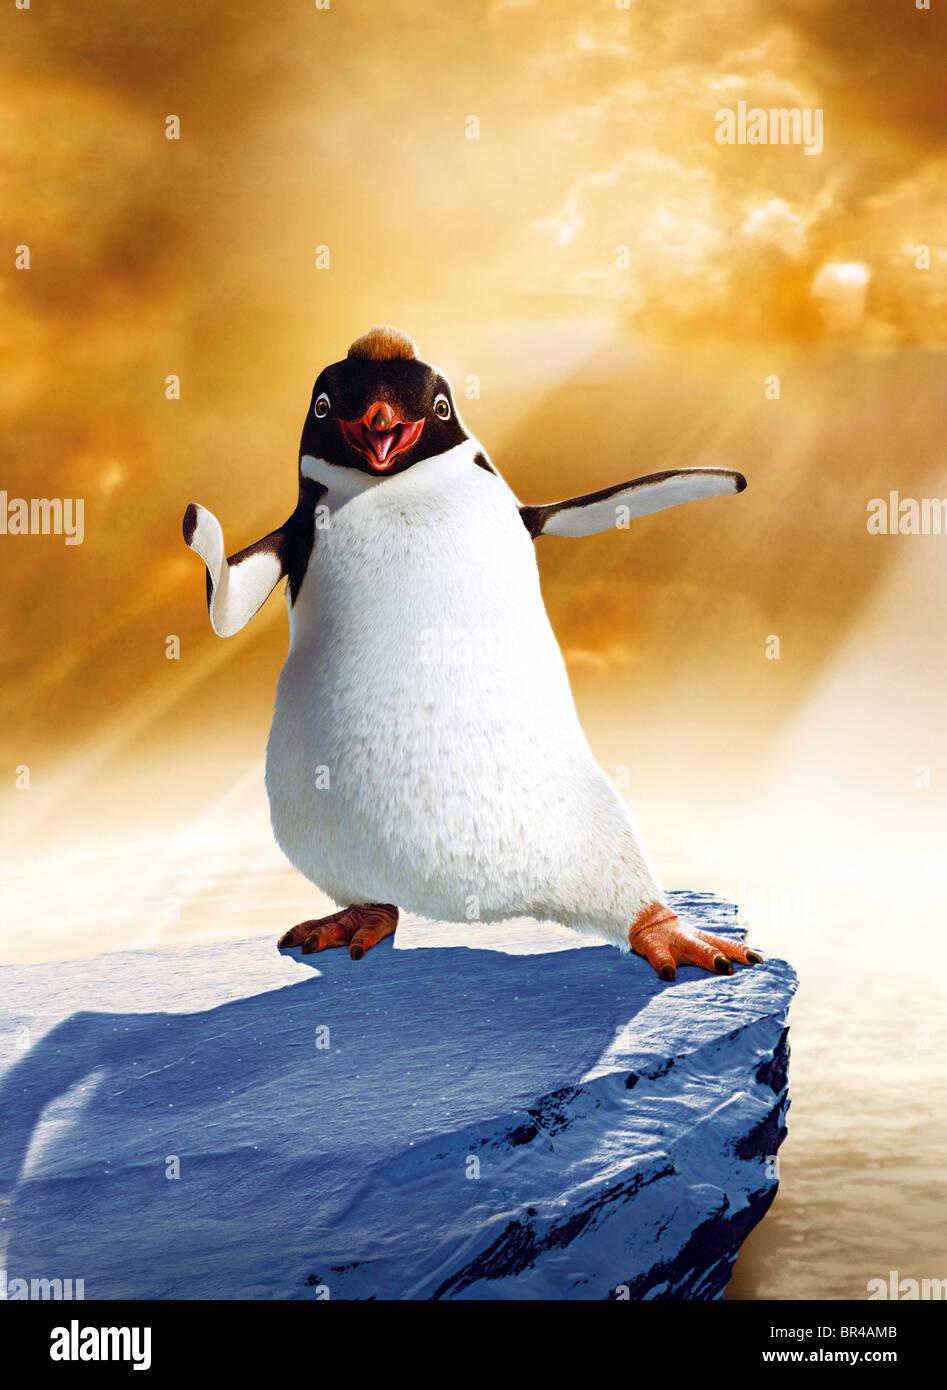 ramon penguin happy feet